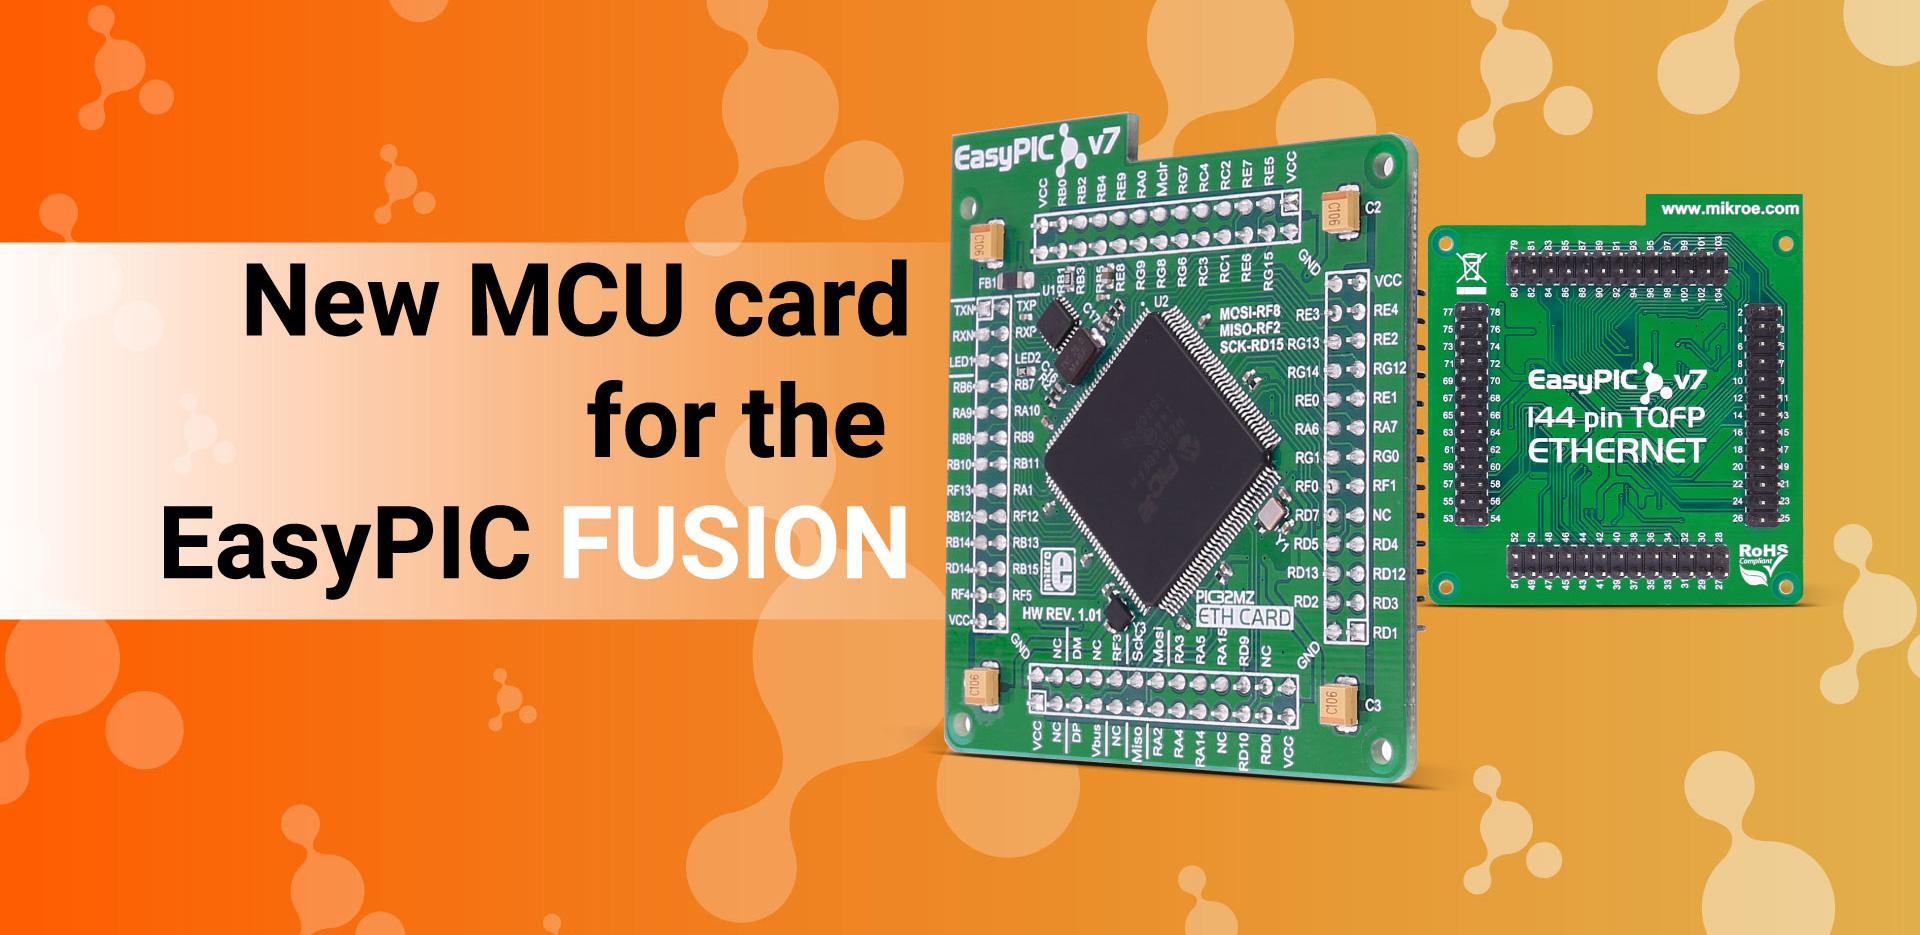 FUSION v7 MCUcard